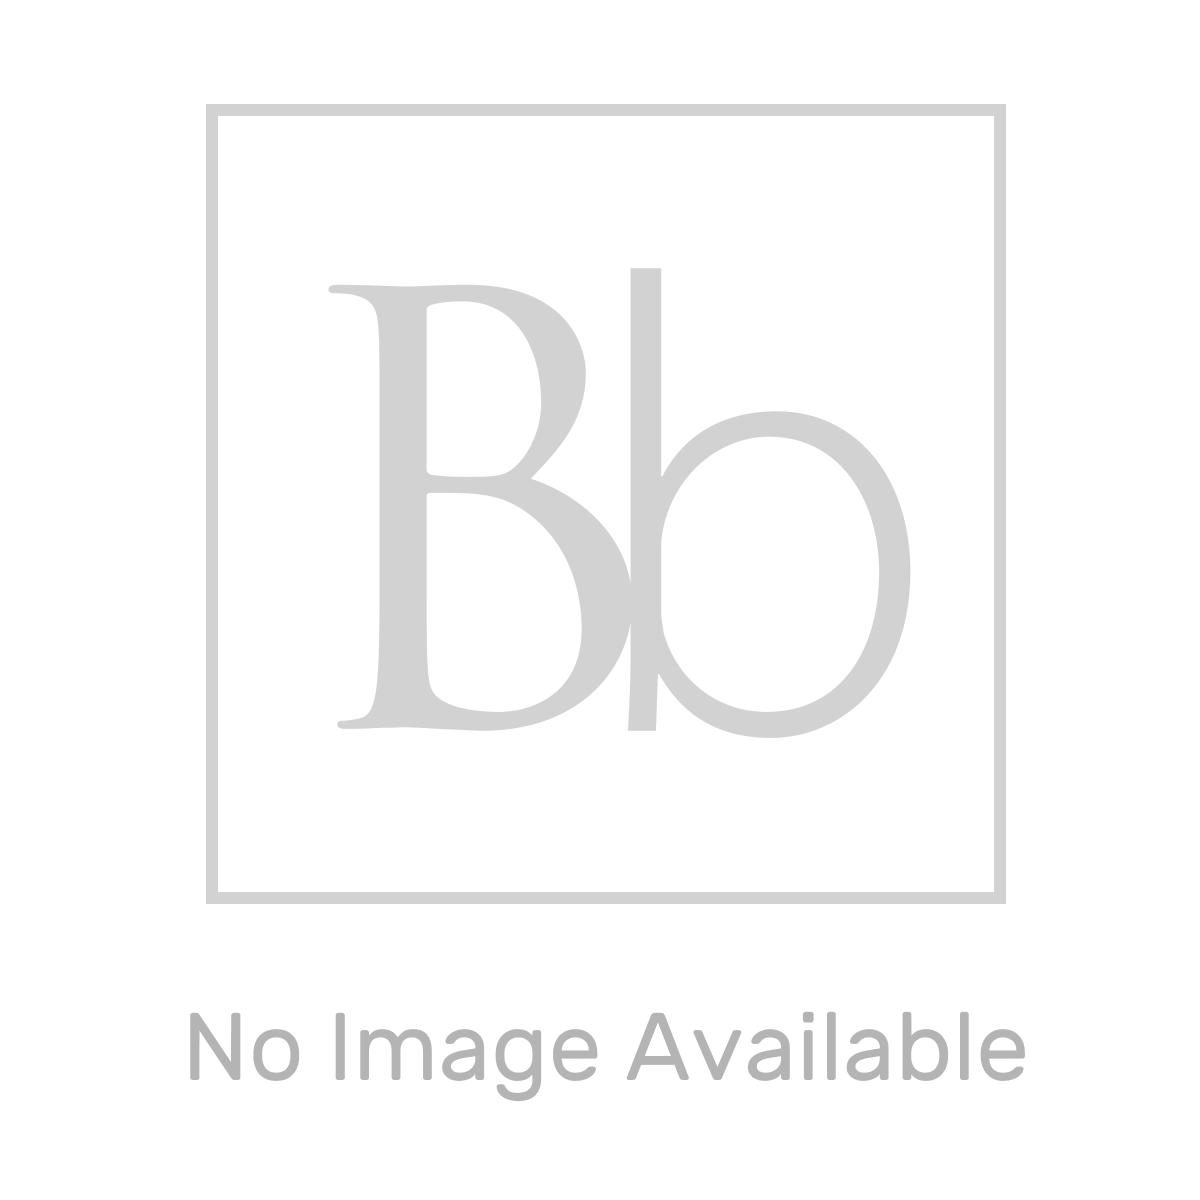 Premier High Gloss White Bathroom Mirror Light Off